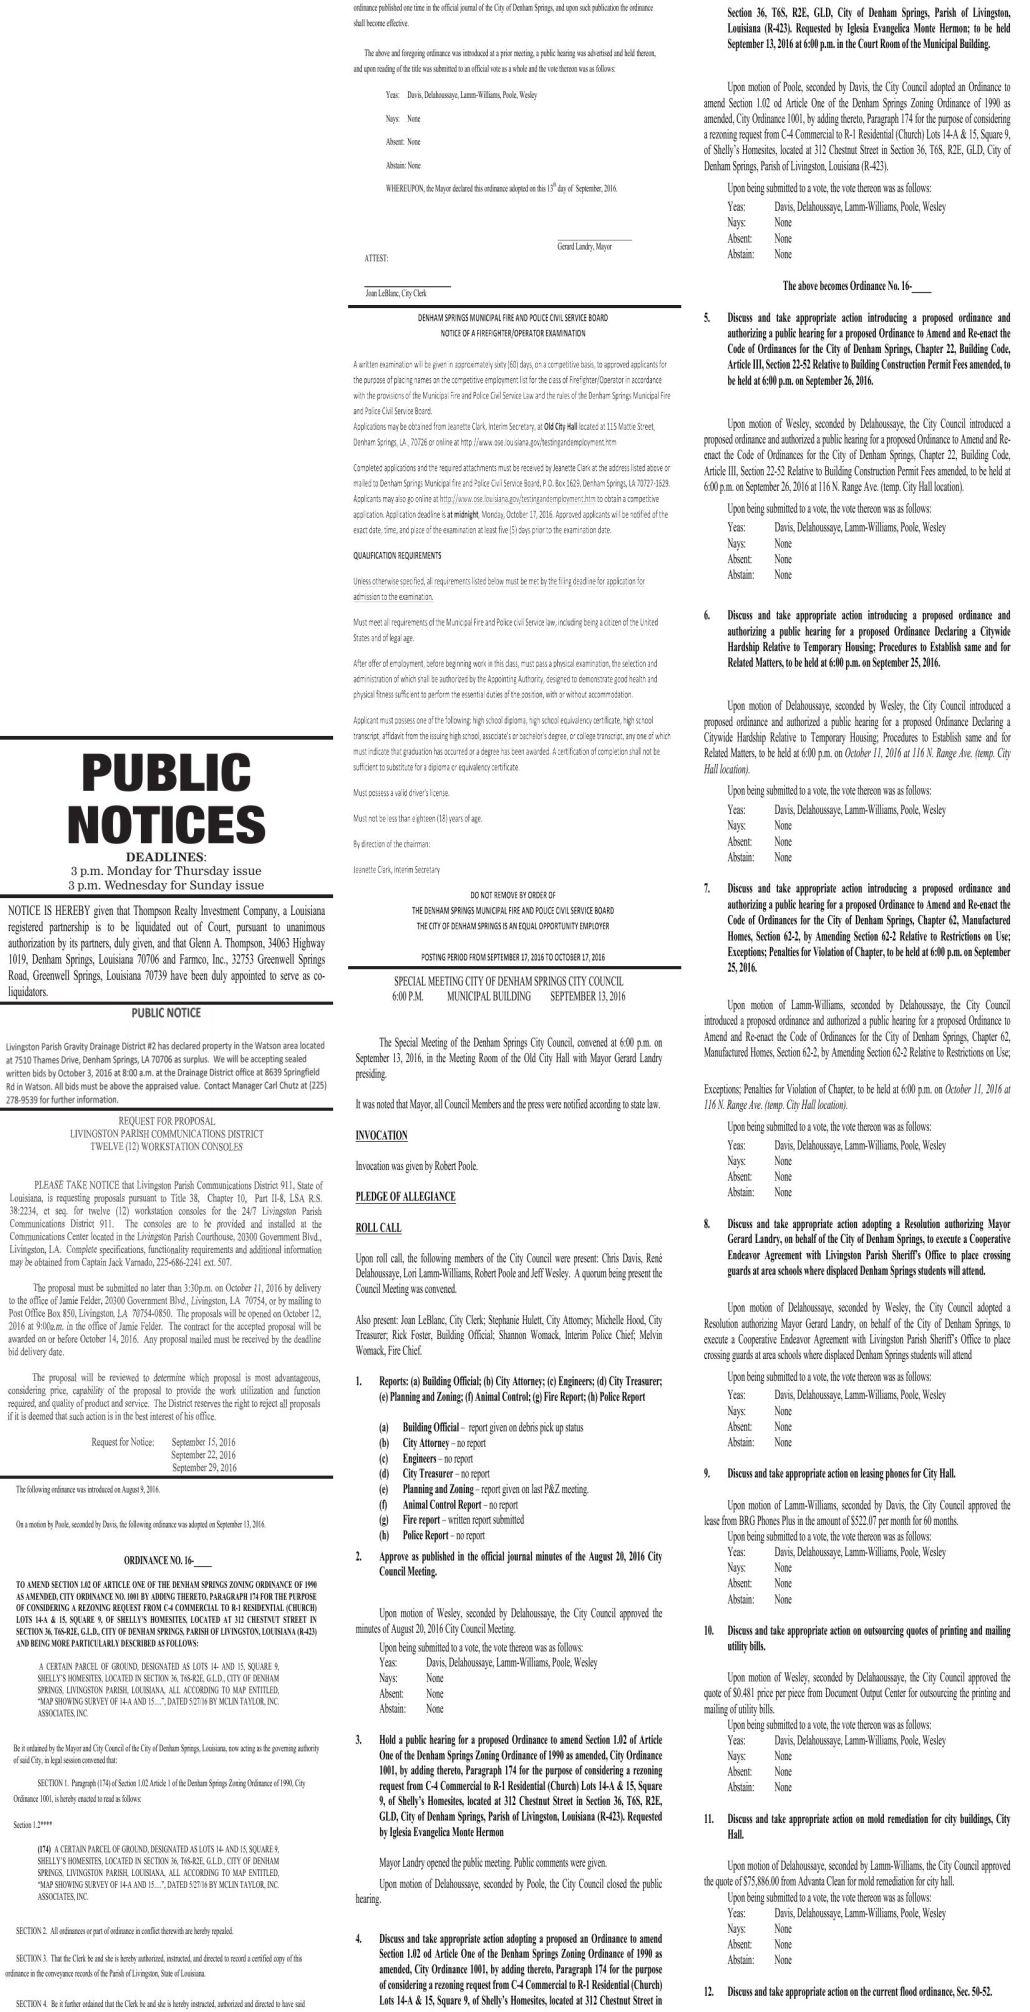 Public Notices published September 22, 2016